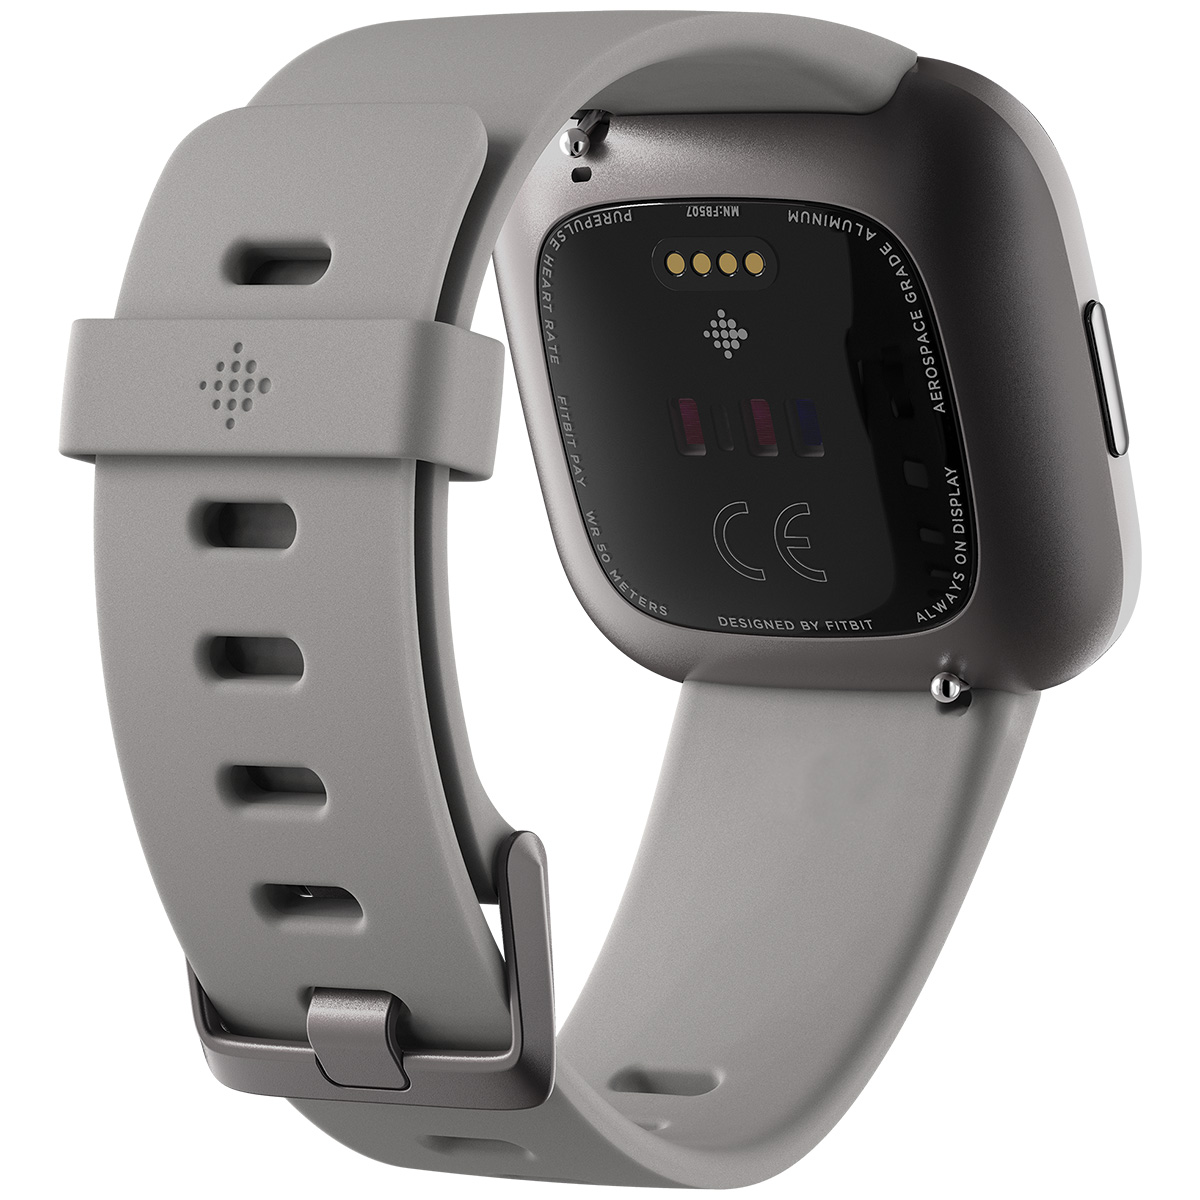 fitbit フィットビット versa 2 ヴァーサ2 フィットネス スマートウォッチ ウェアラブル端末 腕時計 ストーン/ミストグレー アルミニウム FB507GYSR-FRCJK